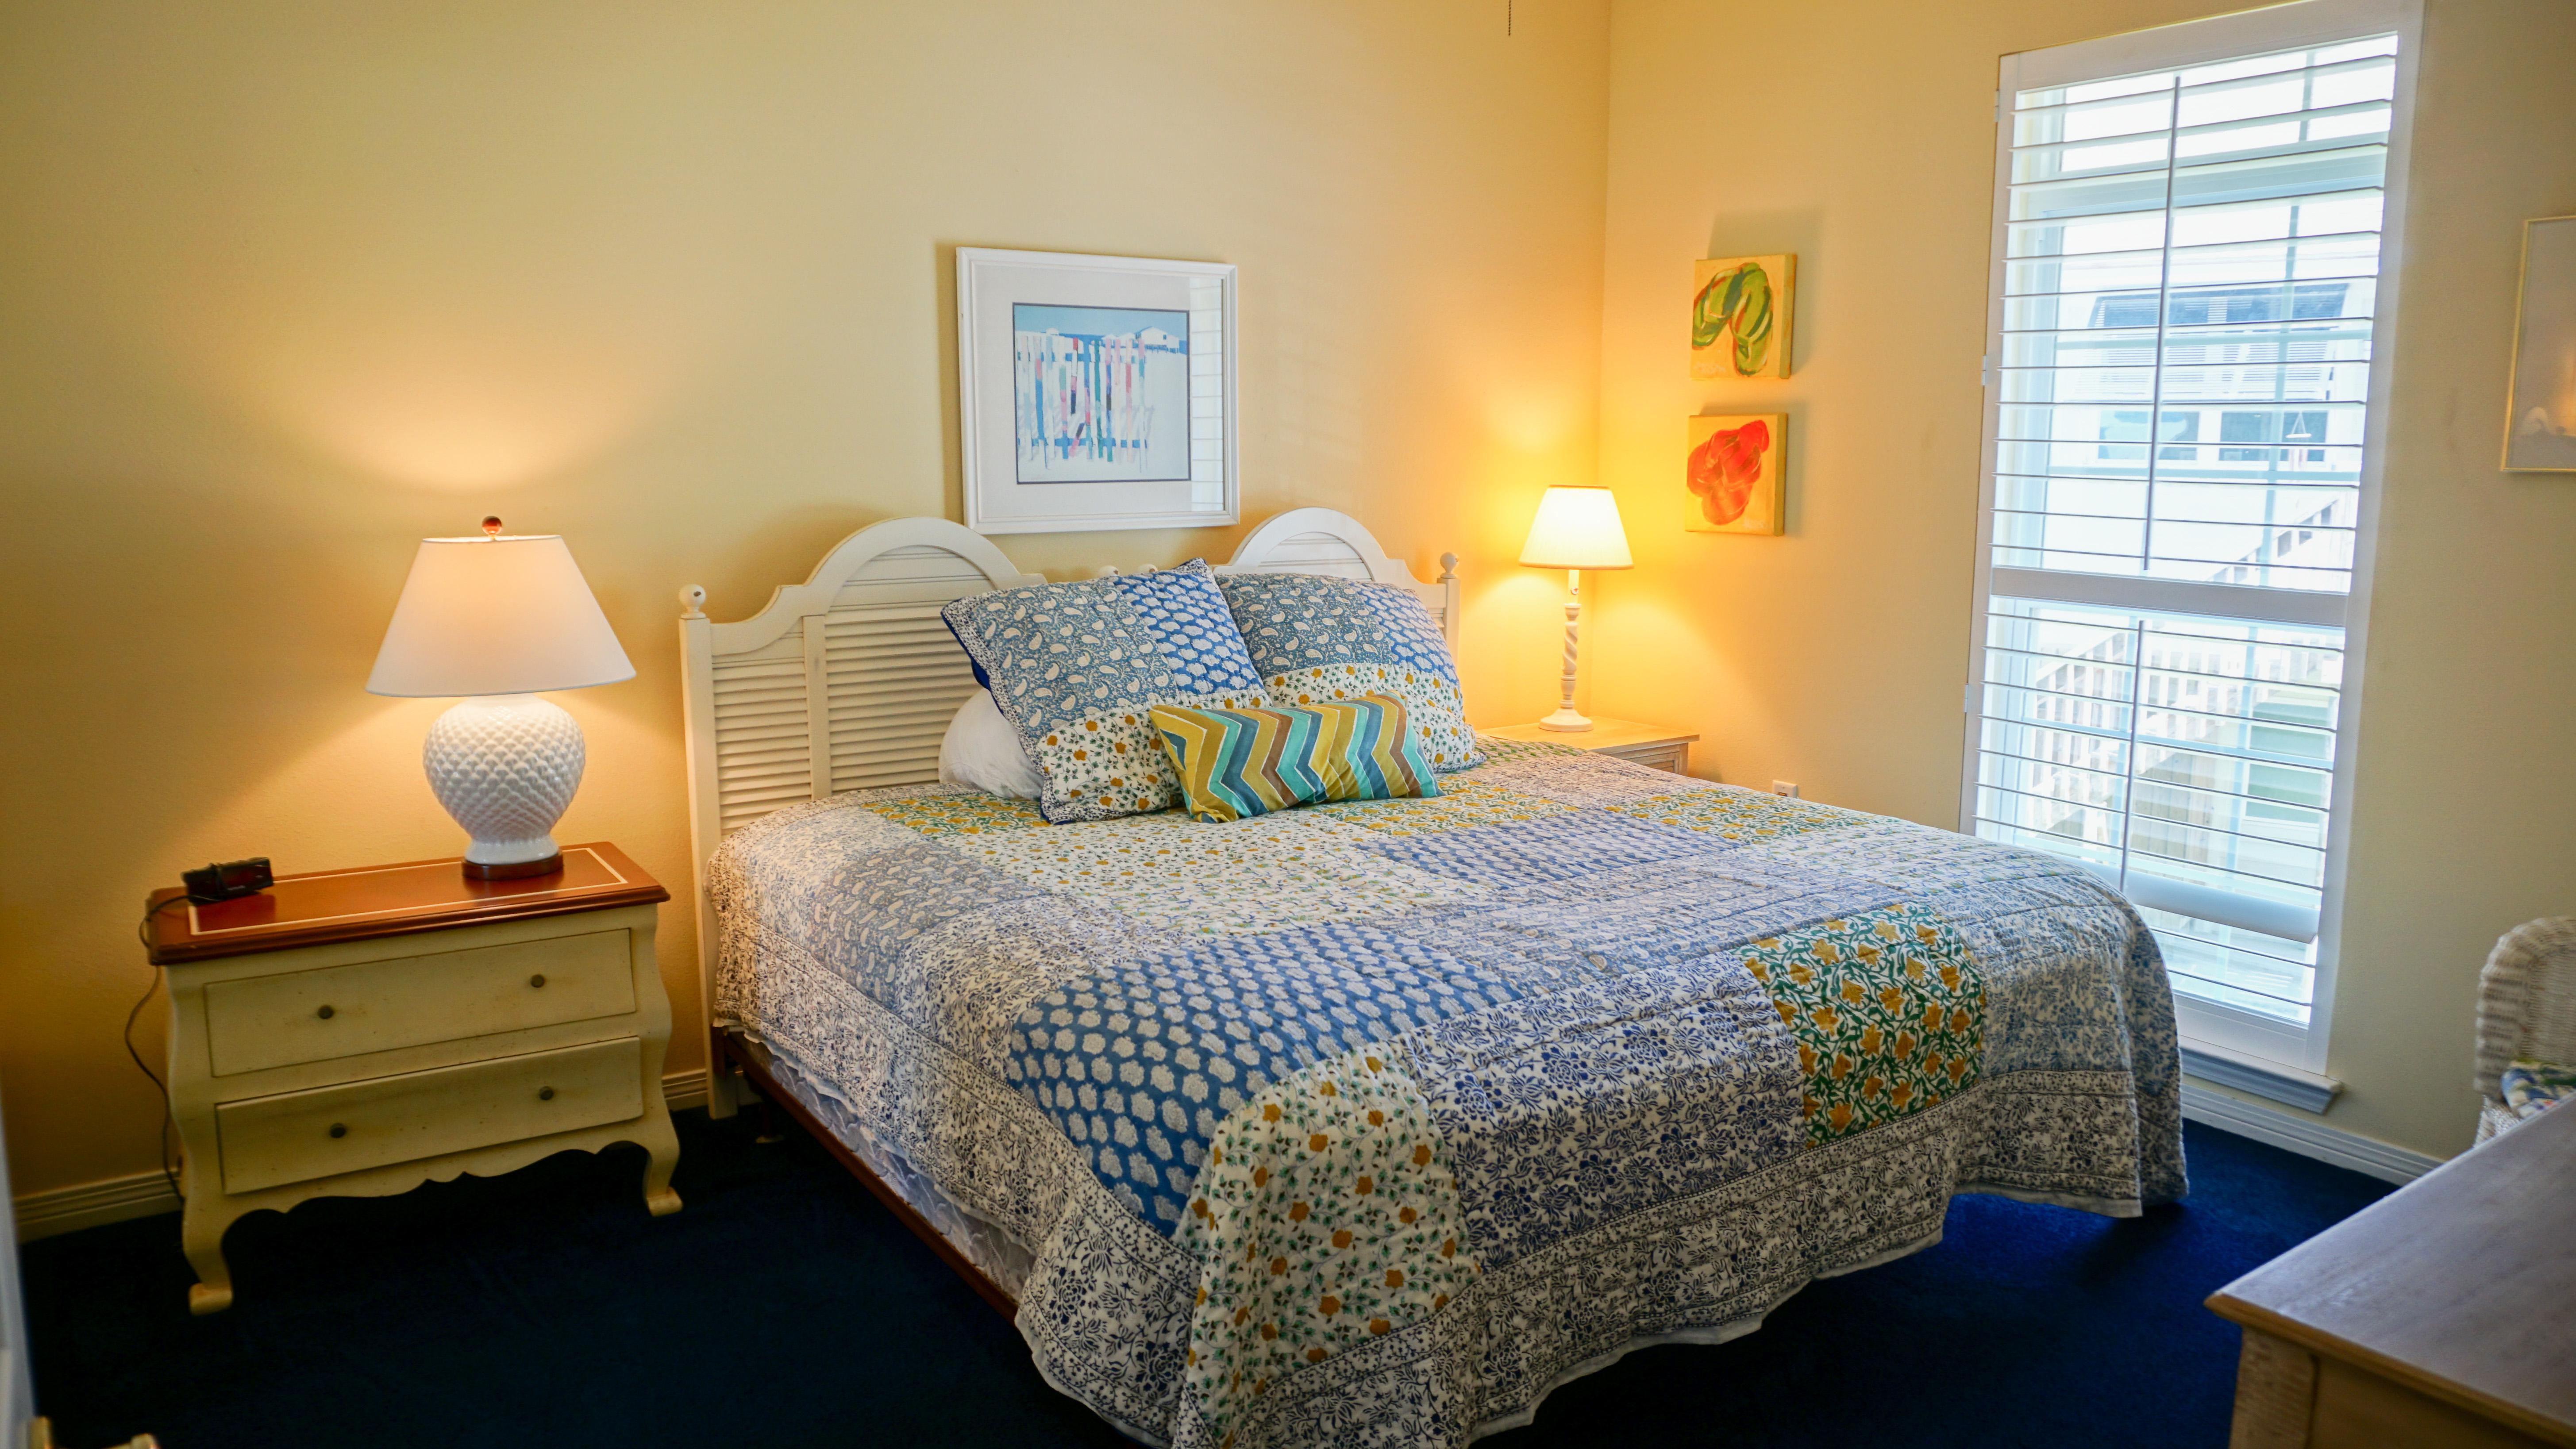 Ensenada Cinco 1730 House/Cottage rental in Pensacola Beach House Rentals in Pensacola Beach Florida - #27